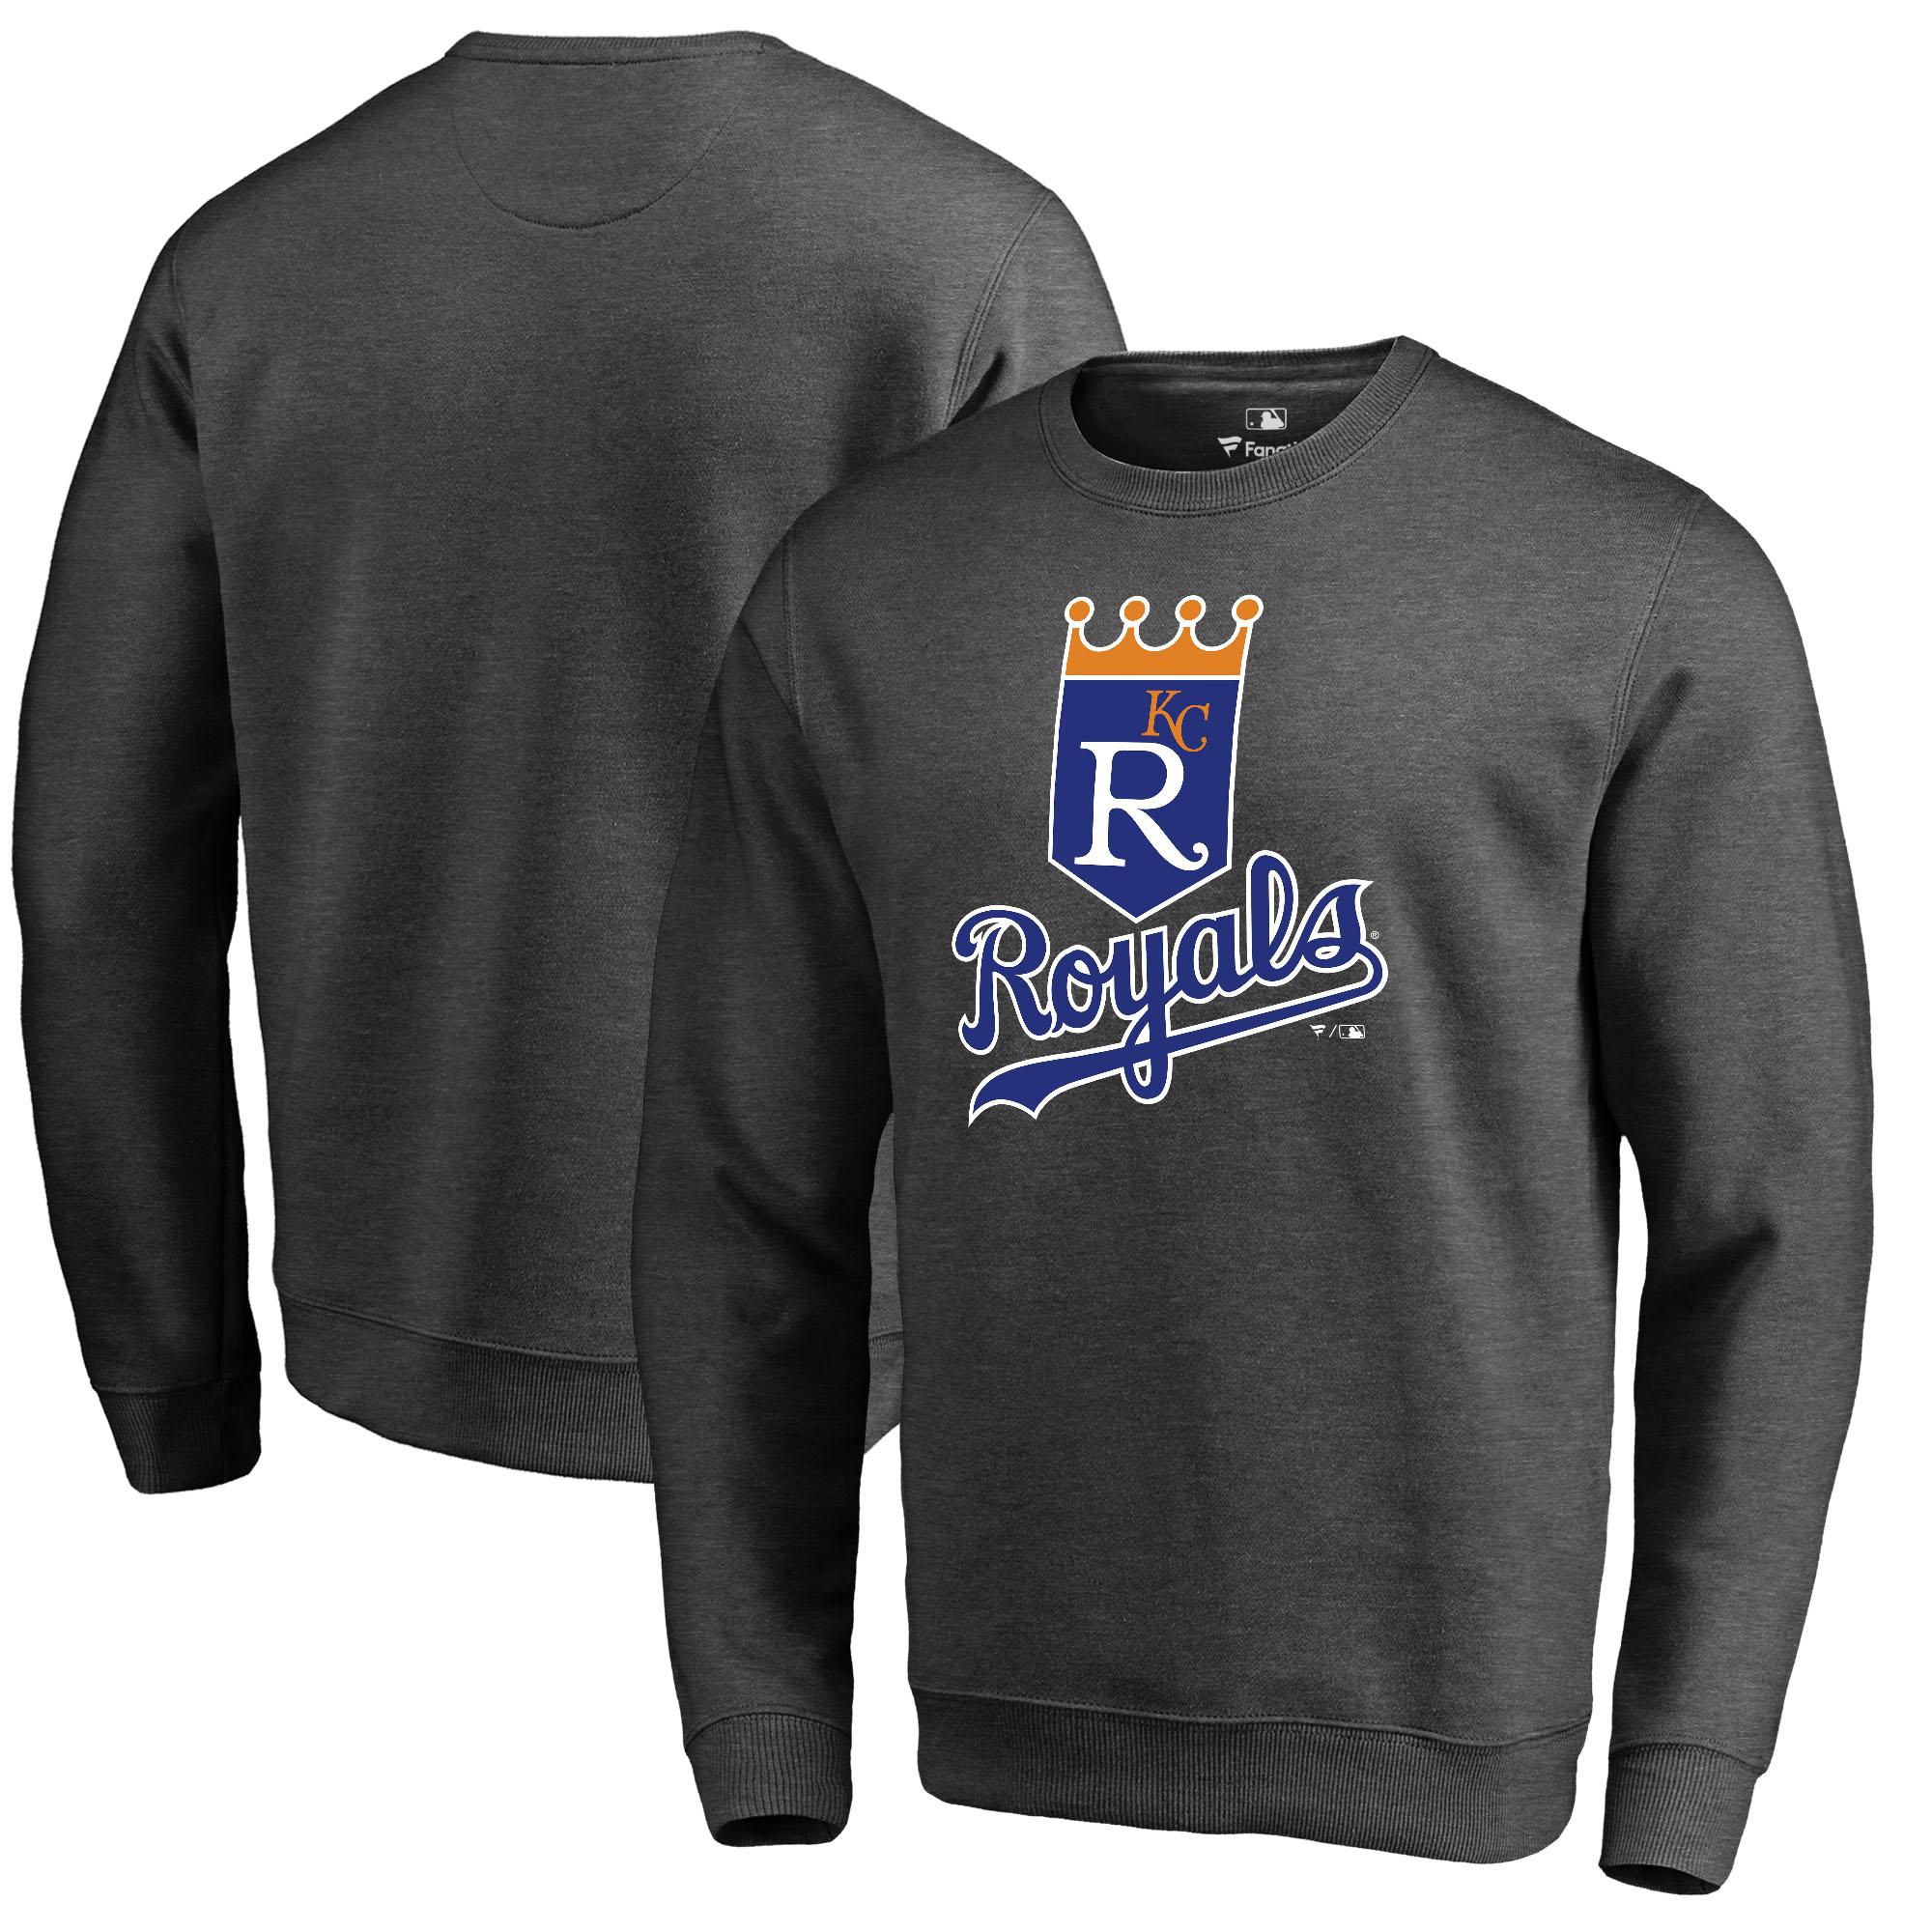 Kansas City Royals Fanatics Branded Cooperstown Collection Huntington Sweatshirt - Heathered Gray